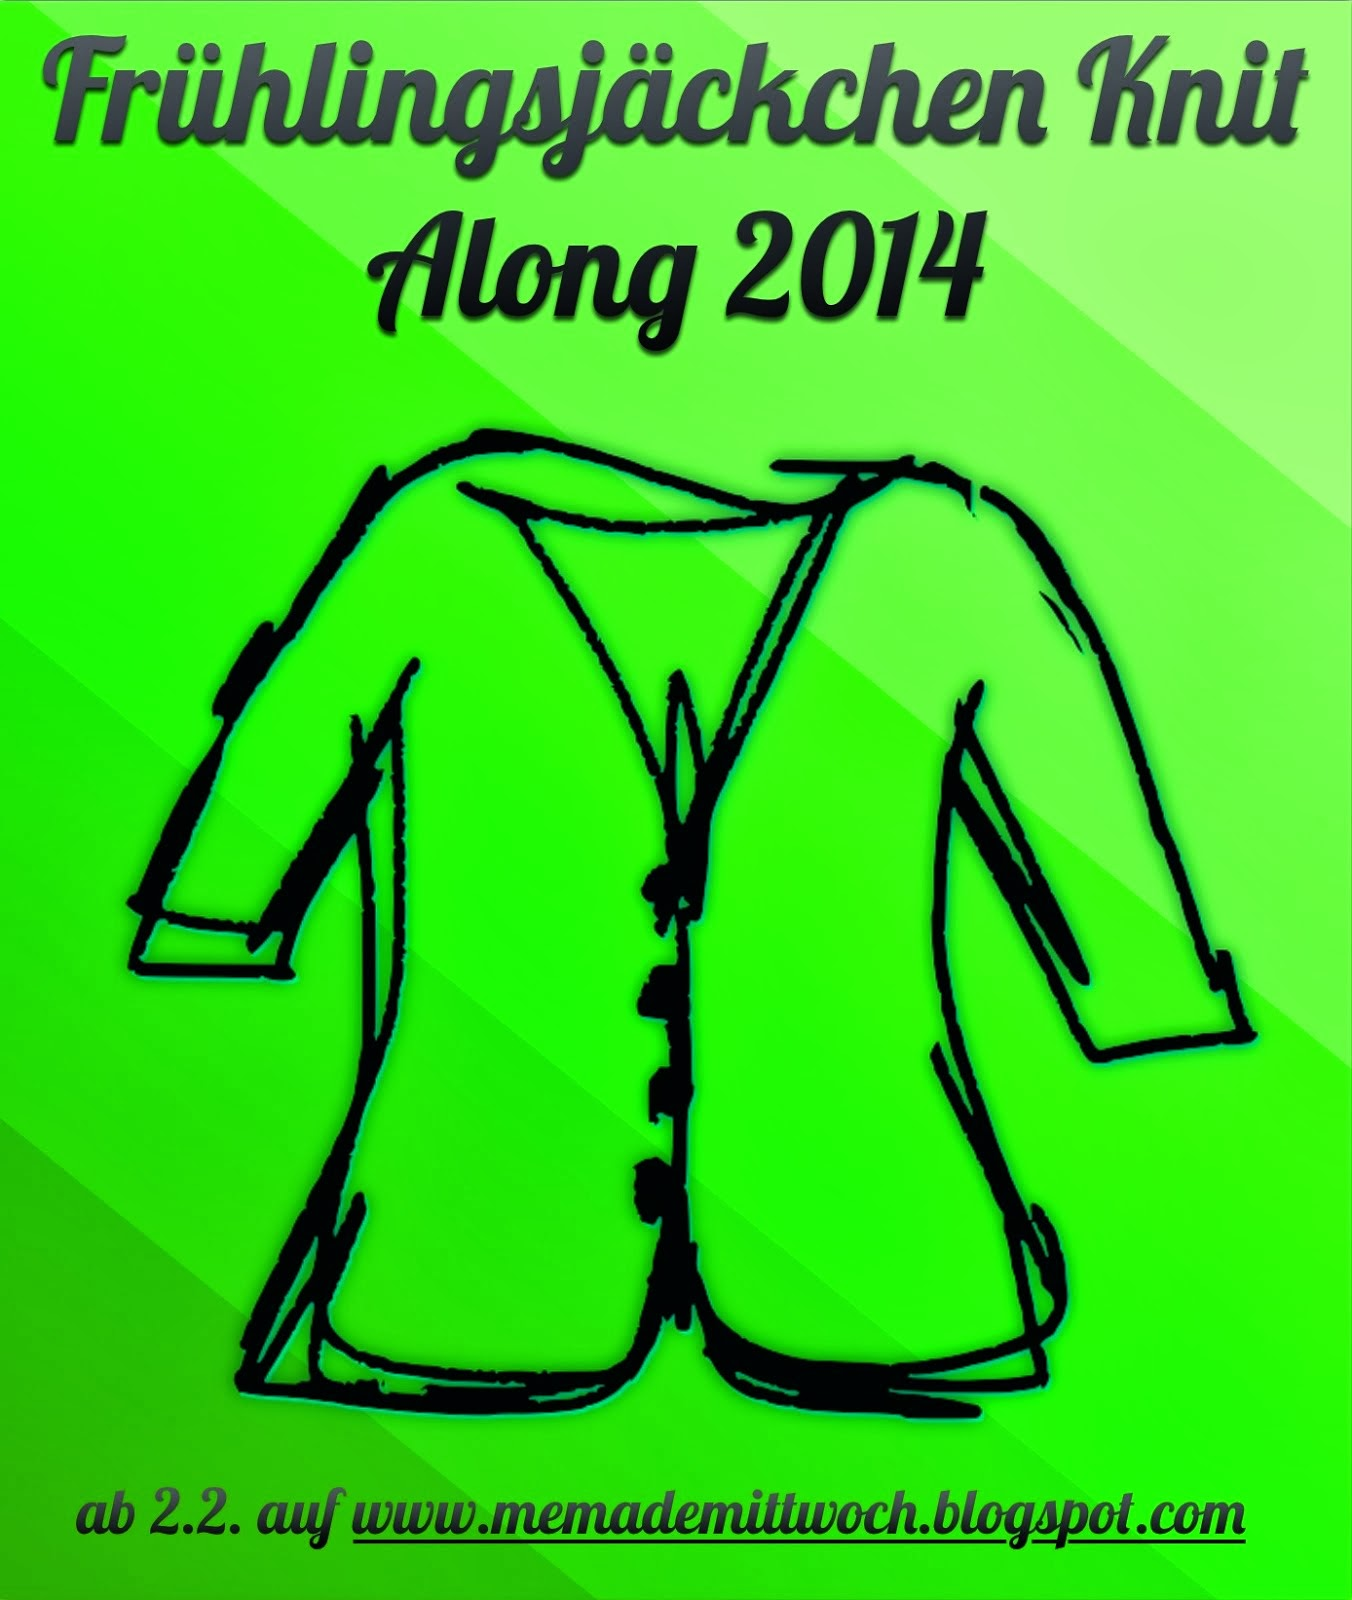 frühlingsjäckchen-knitalong 2014